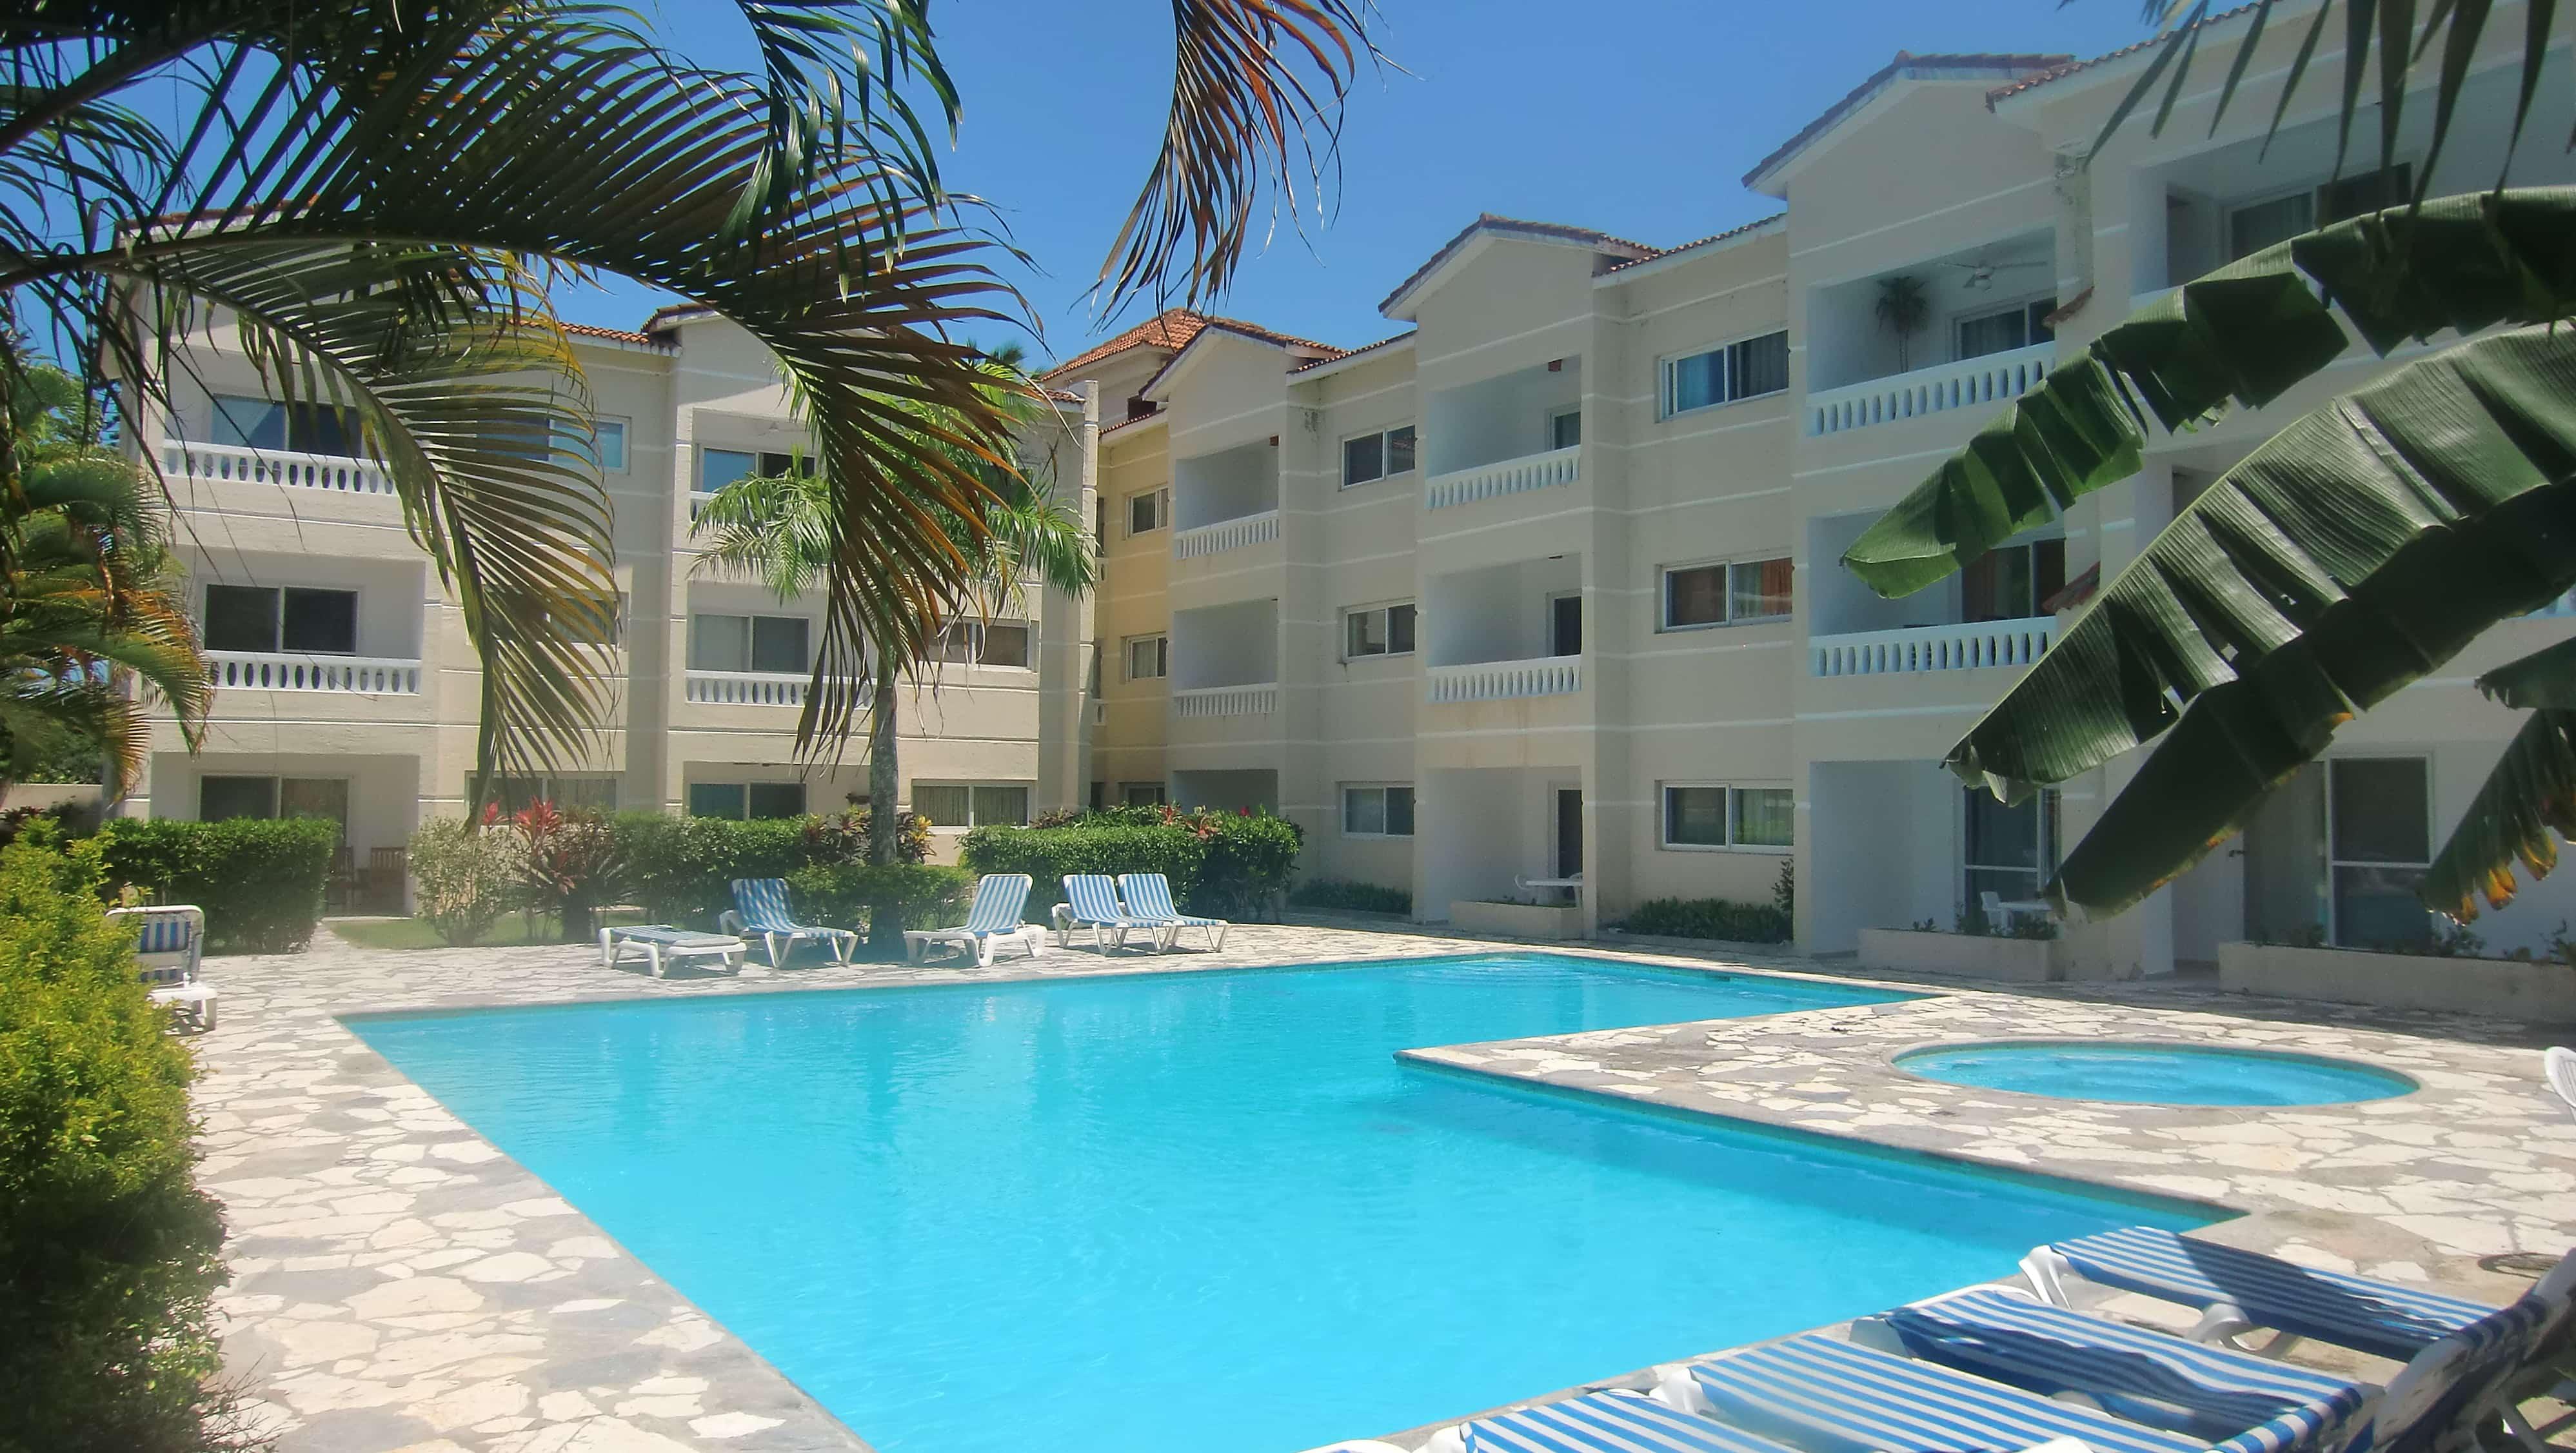 Blick vom Pool auf das Hotel Dulce Vida in Cabarete